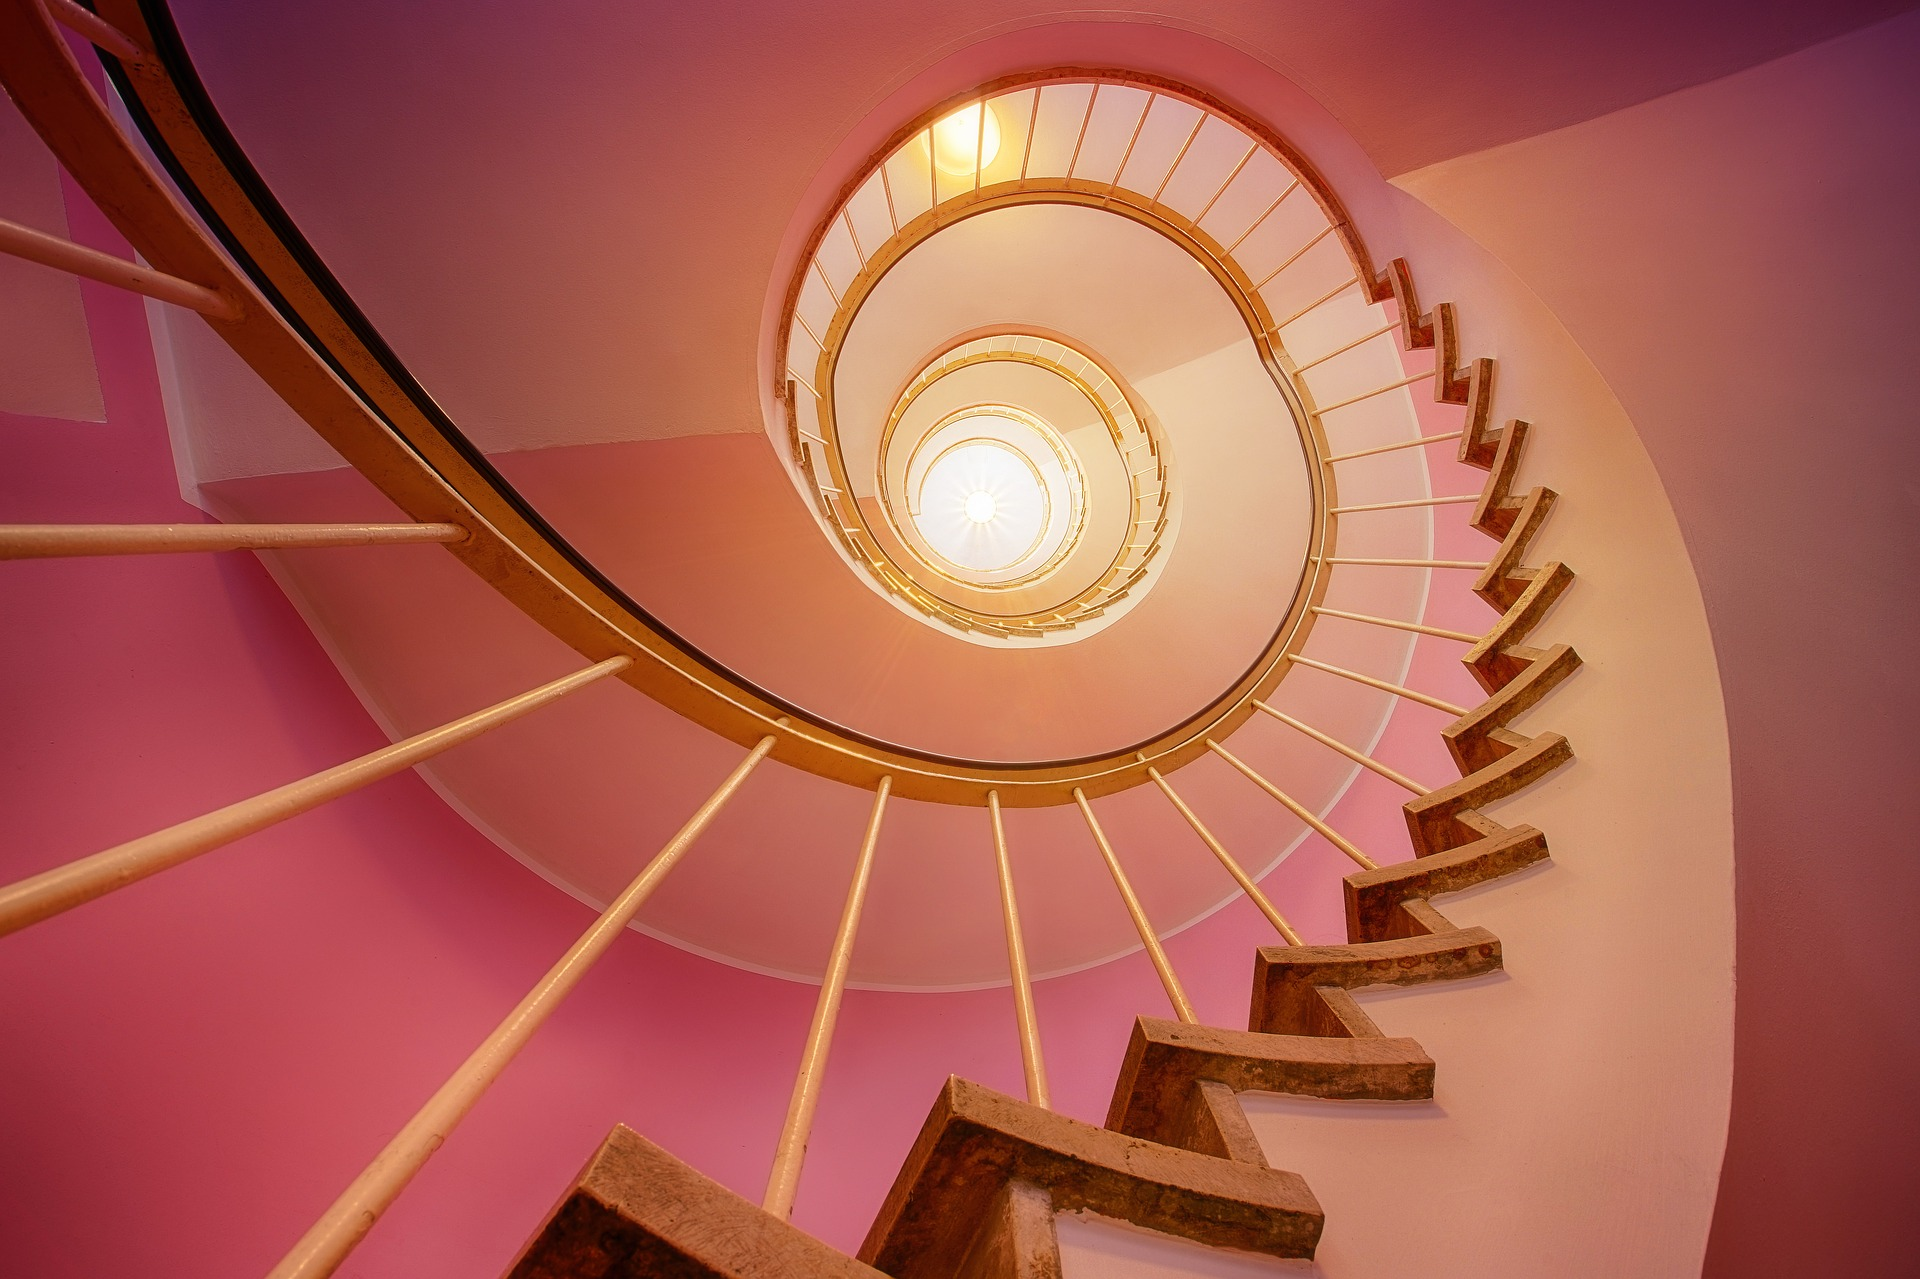 totul o ia razna - sfatulprintilor.ro - pixabay_com - stairs-3112405_1920